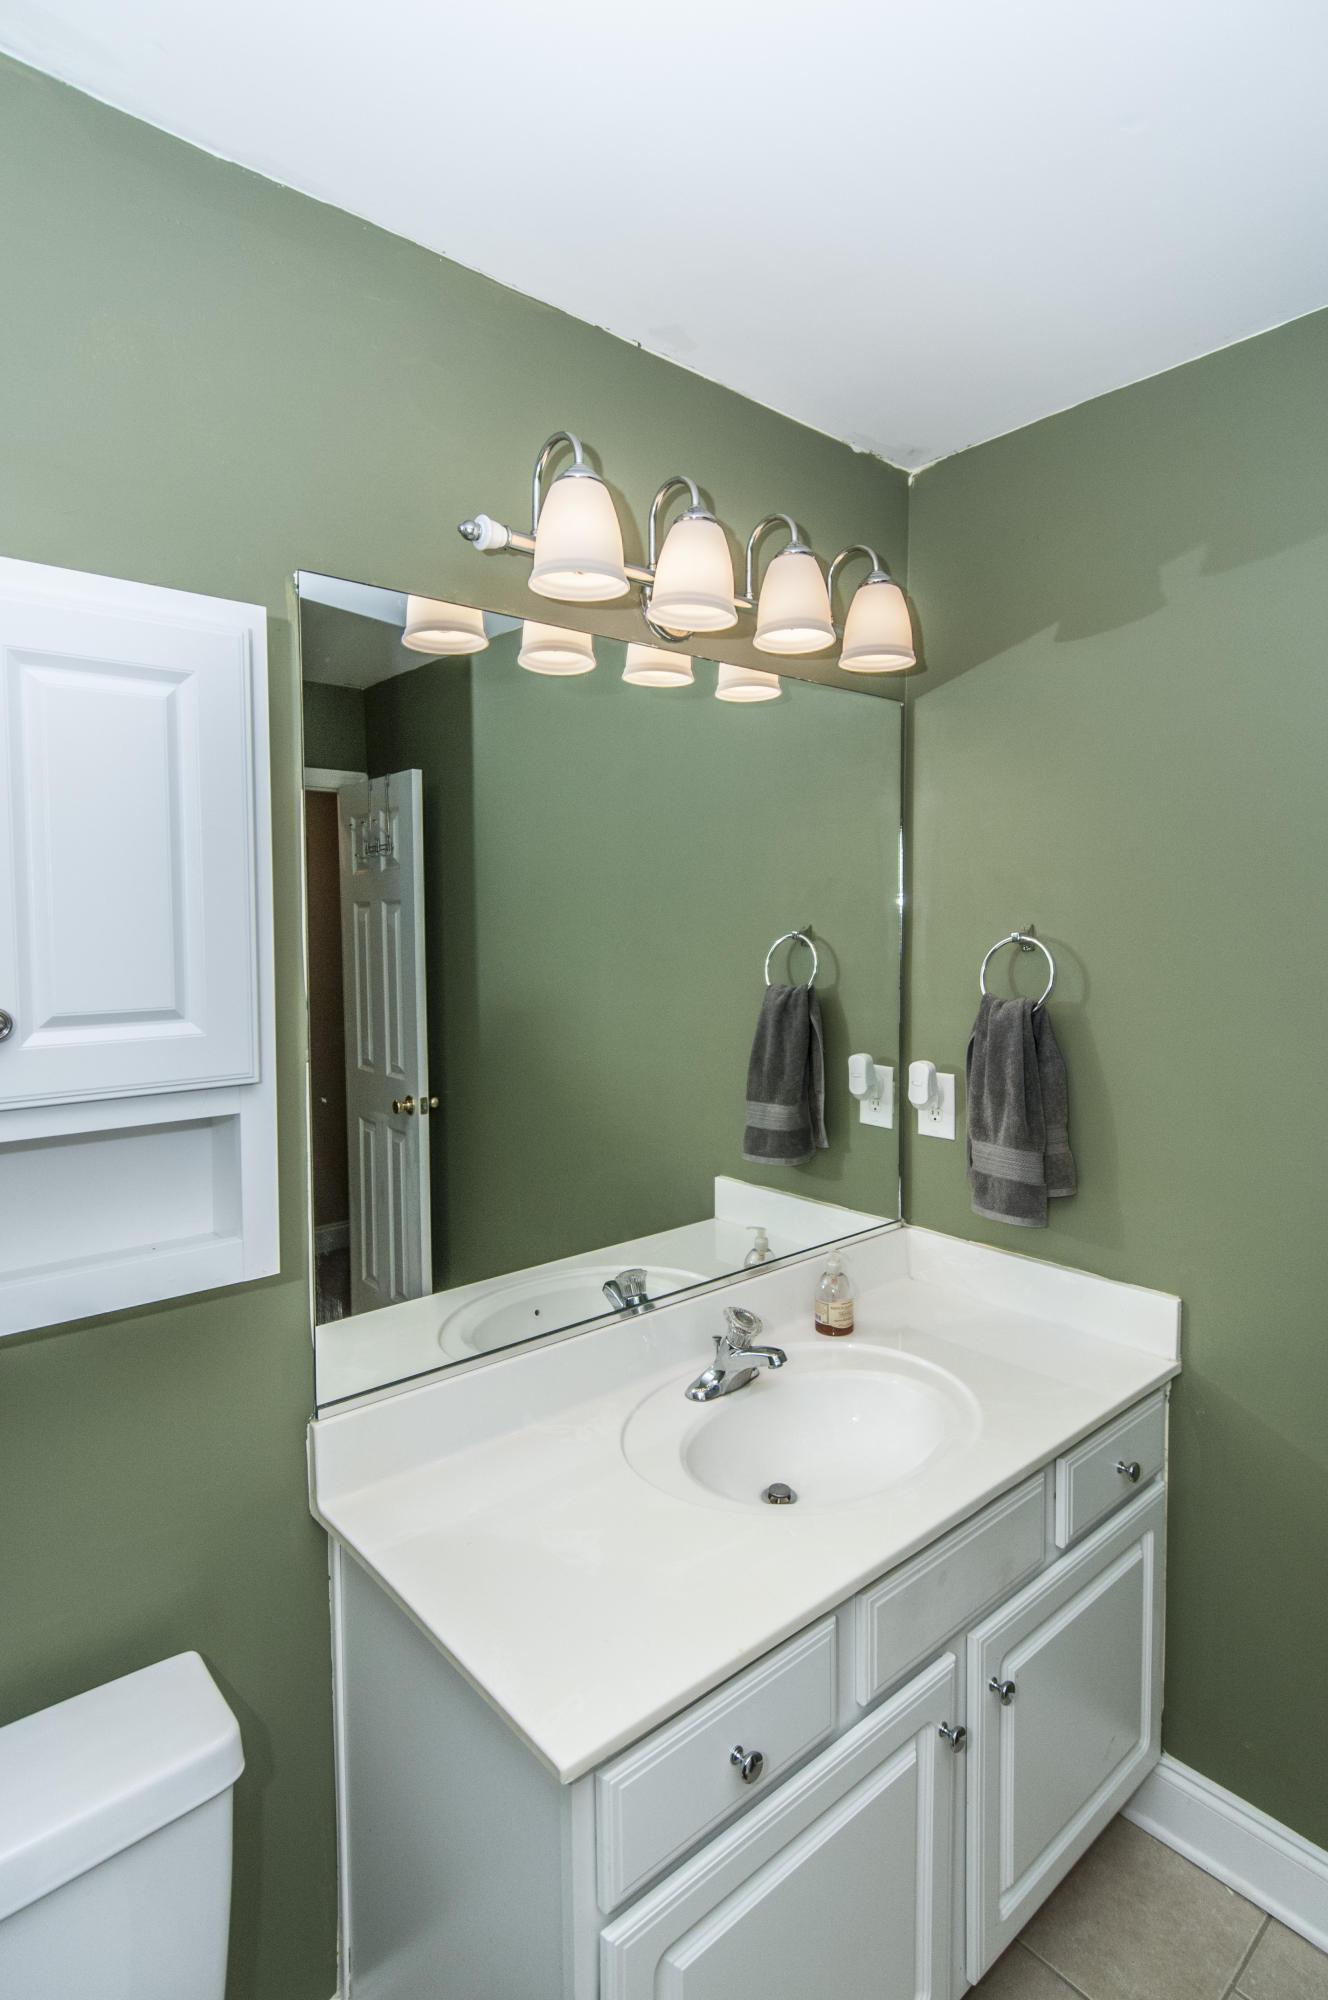 Longbranch Point Homes For Sale - 940 Estates, Charleston, SC - 6